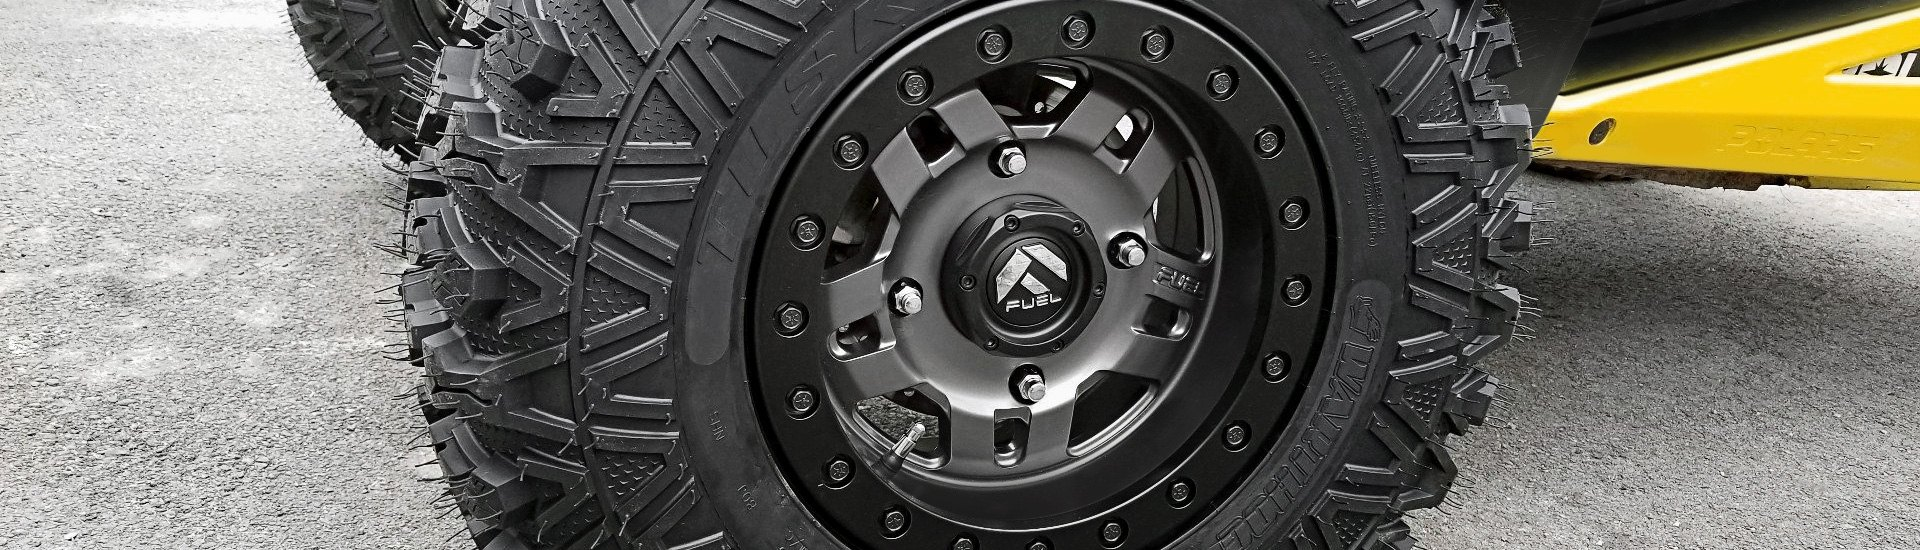 Powersports Wheels Tires